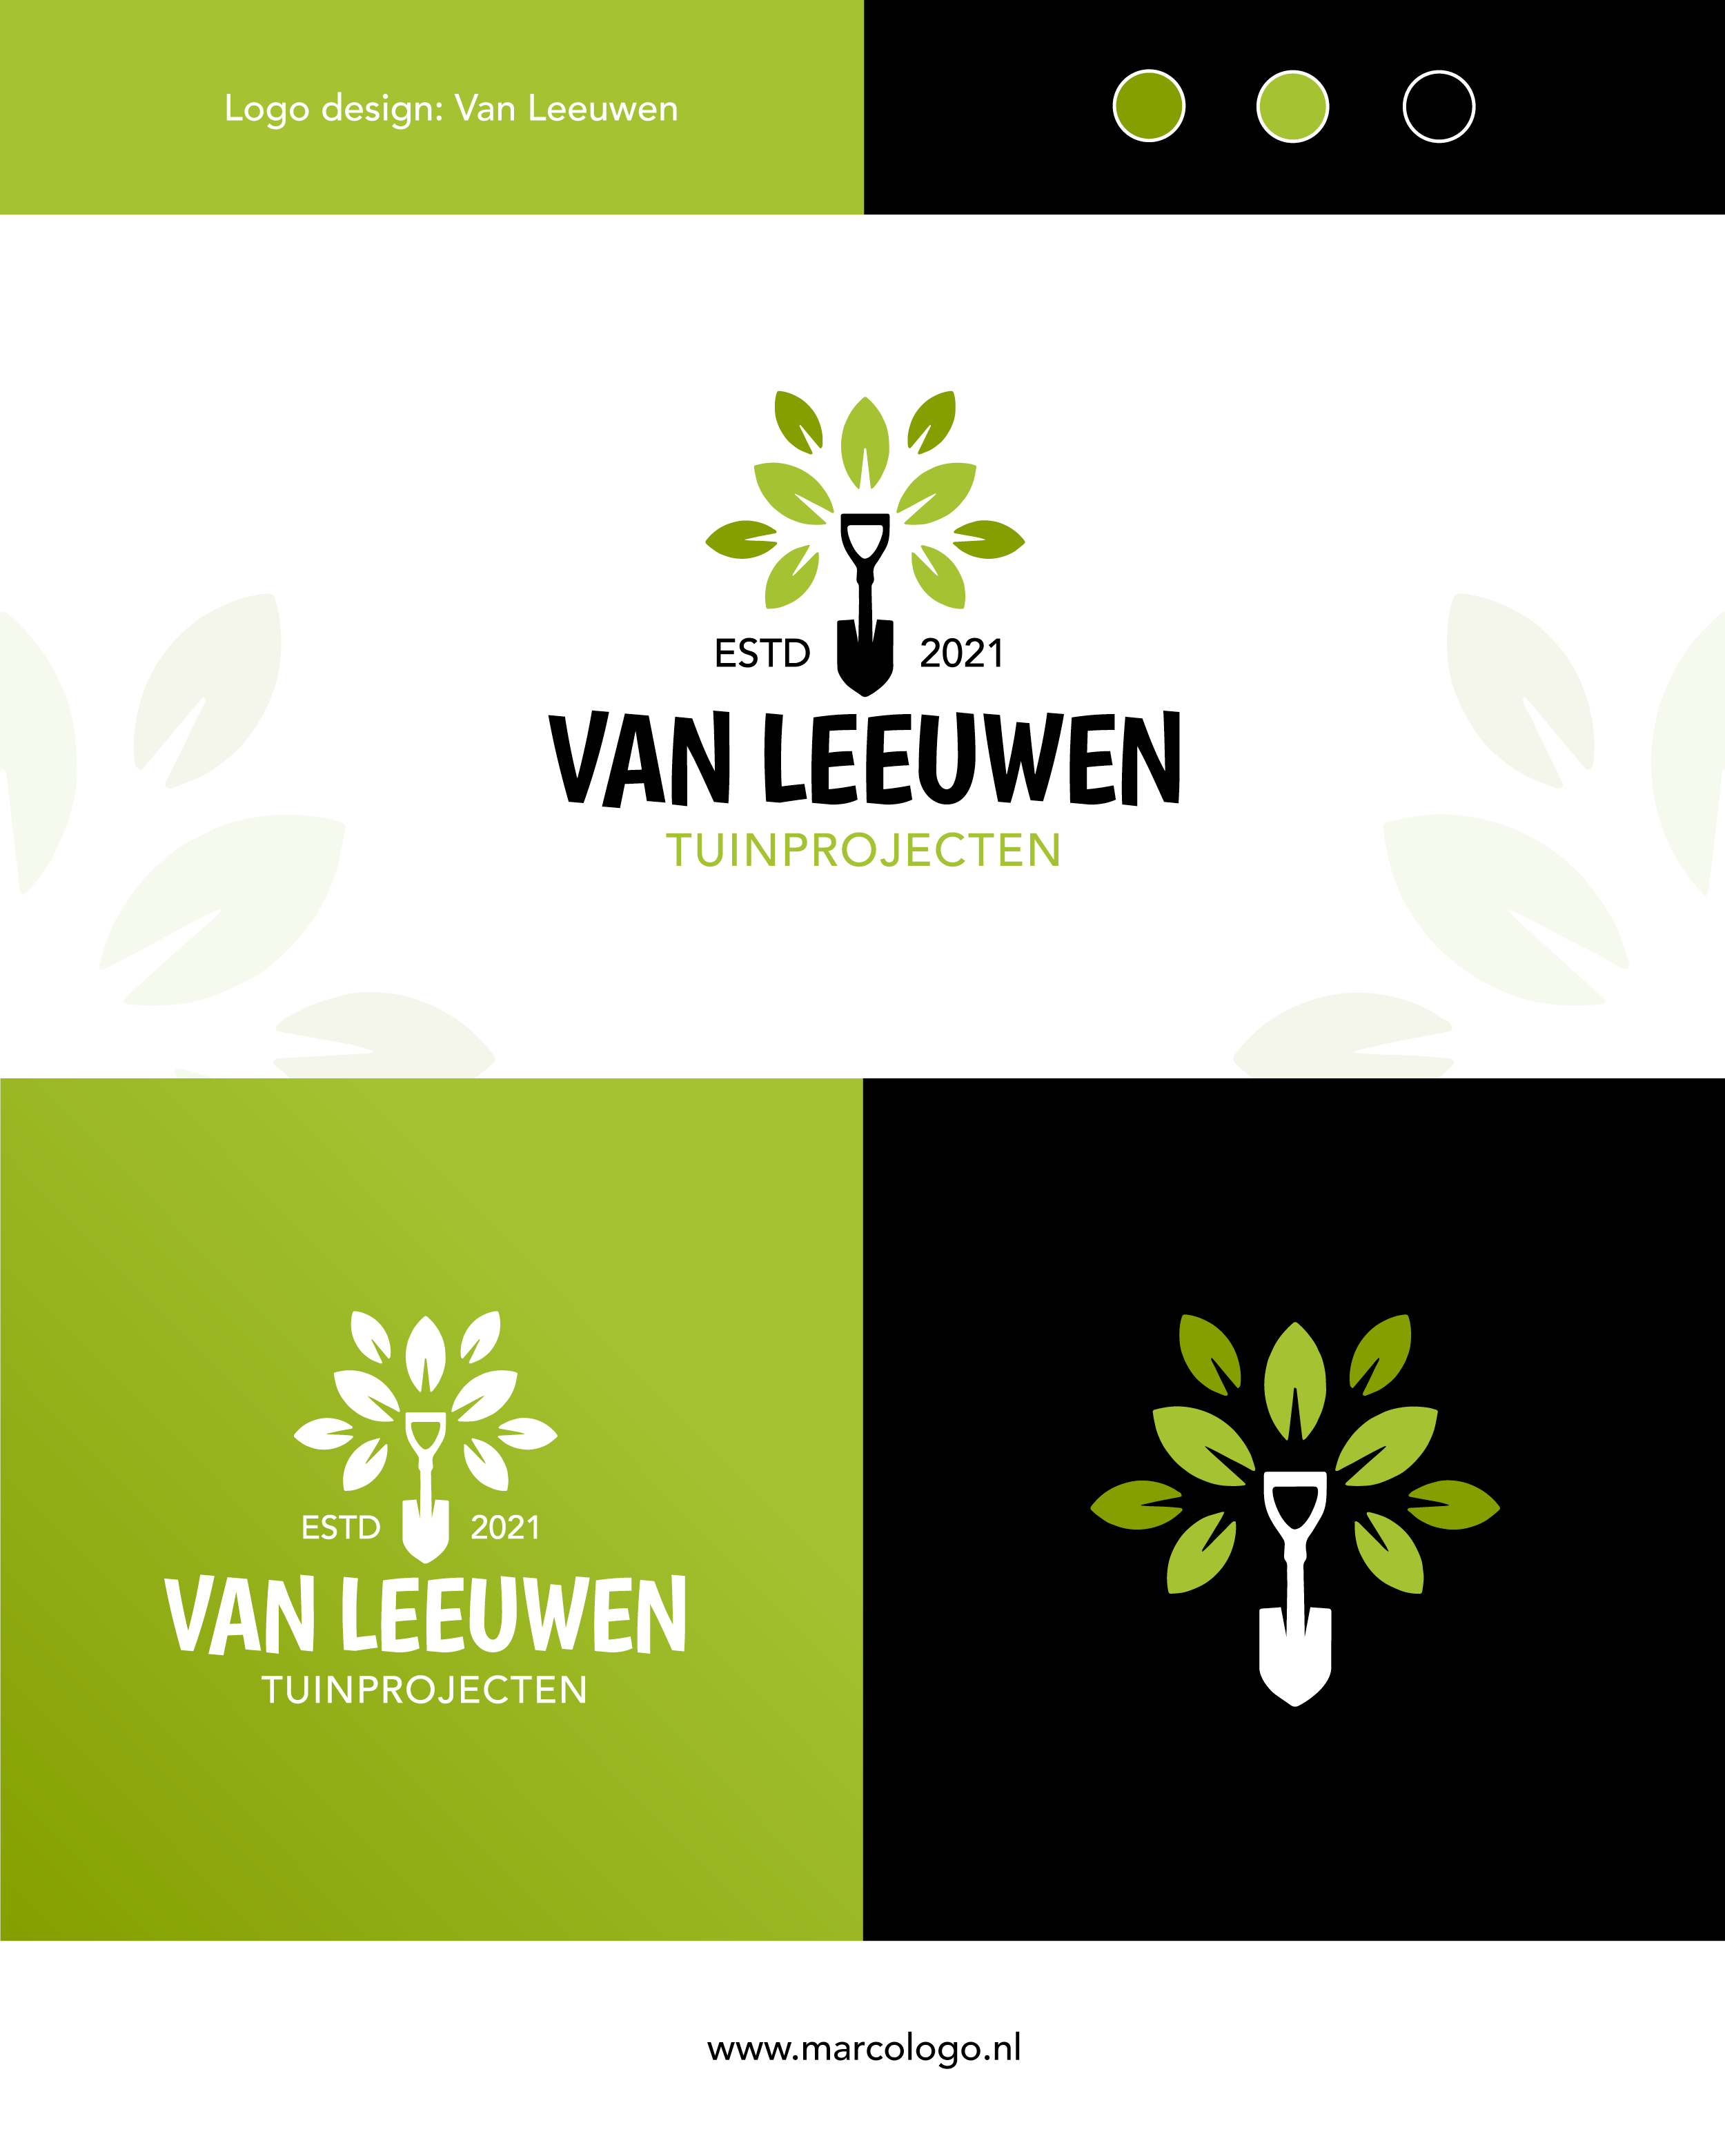 Van-leeuwen-logo-2.1